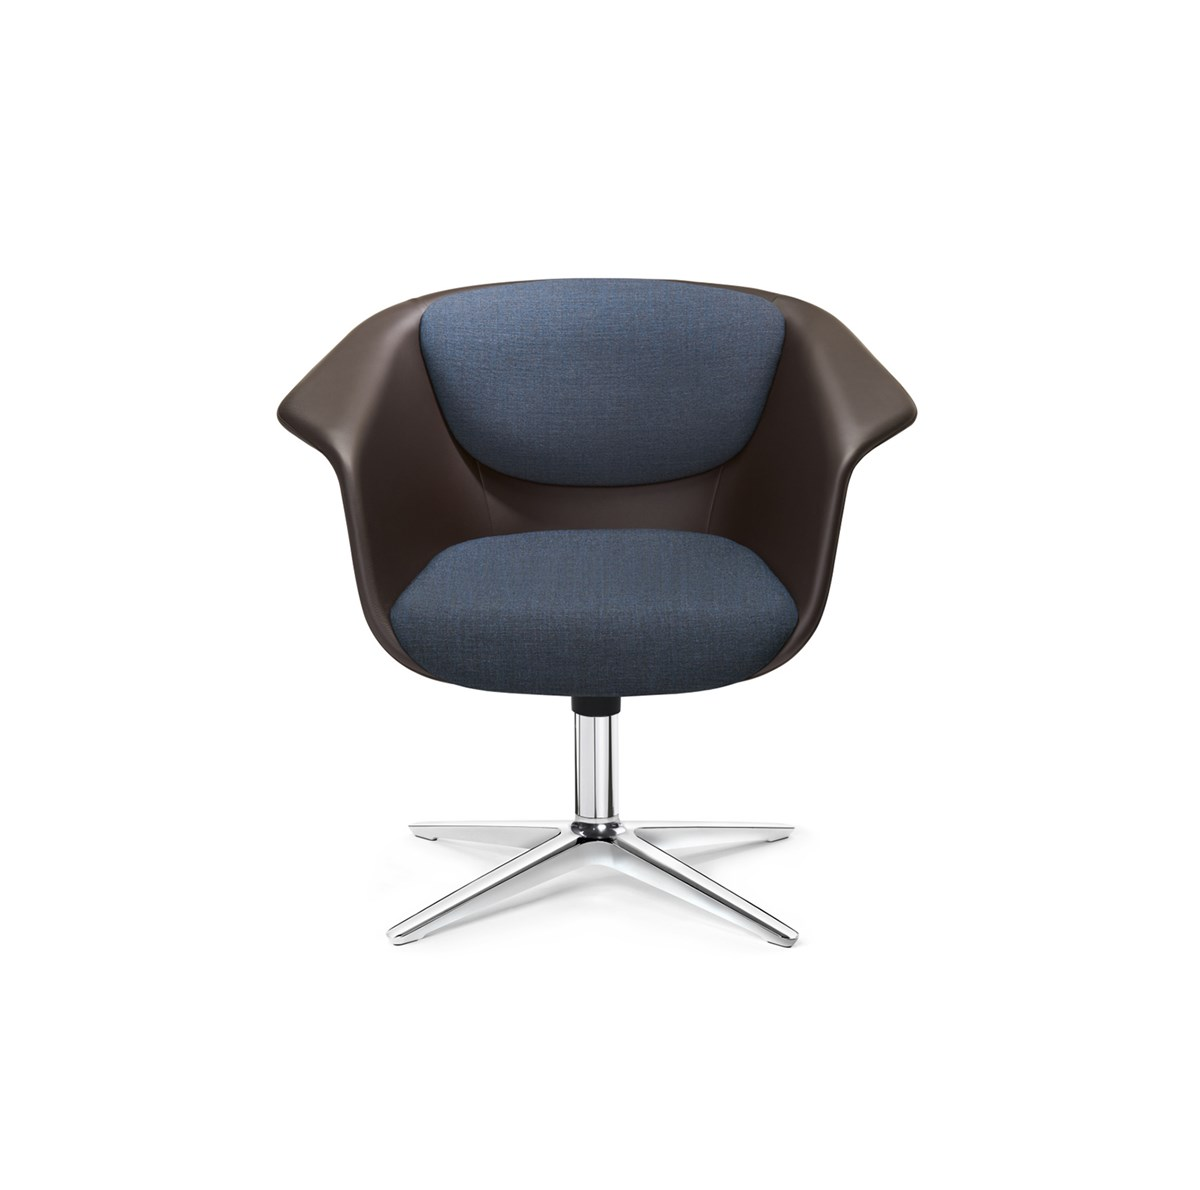 Sedus-Sweetspot-Armchair-Matisse-1